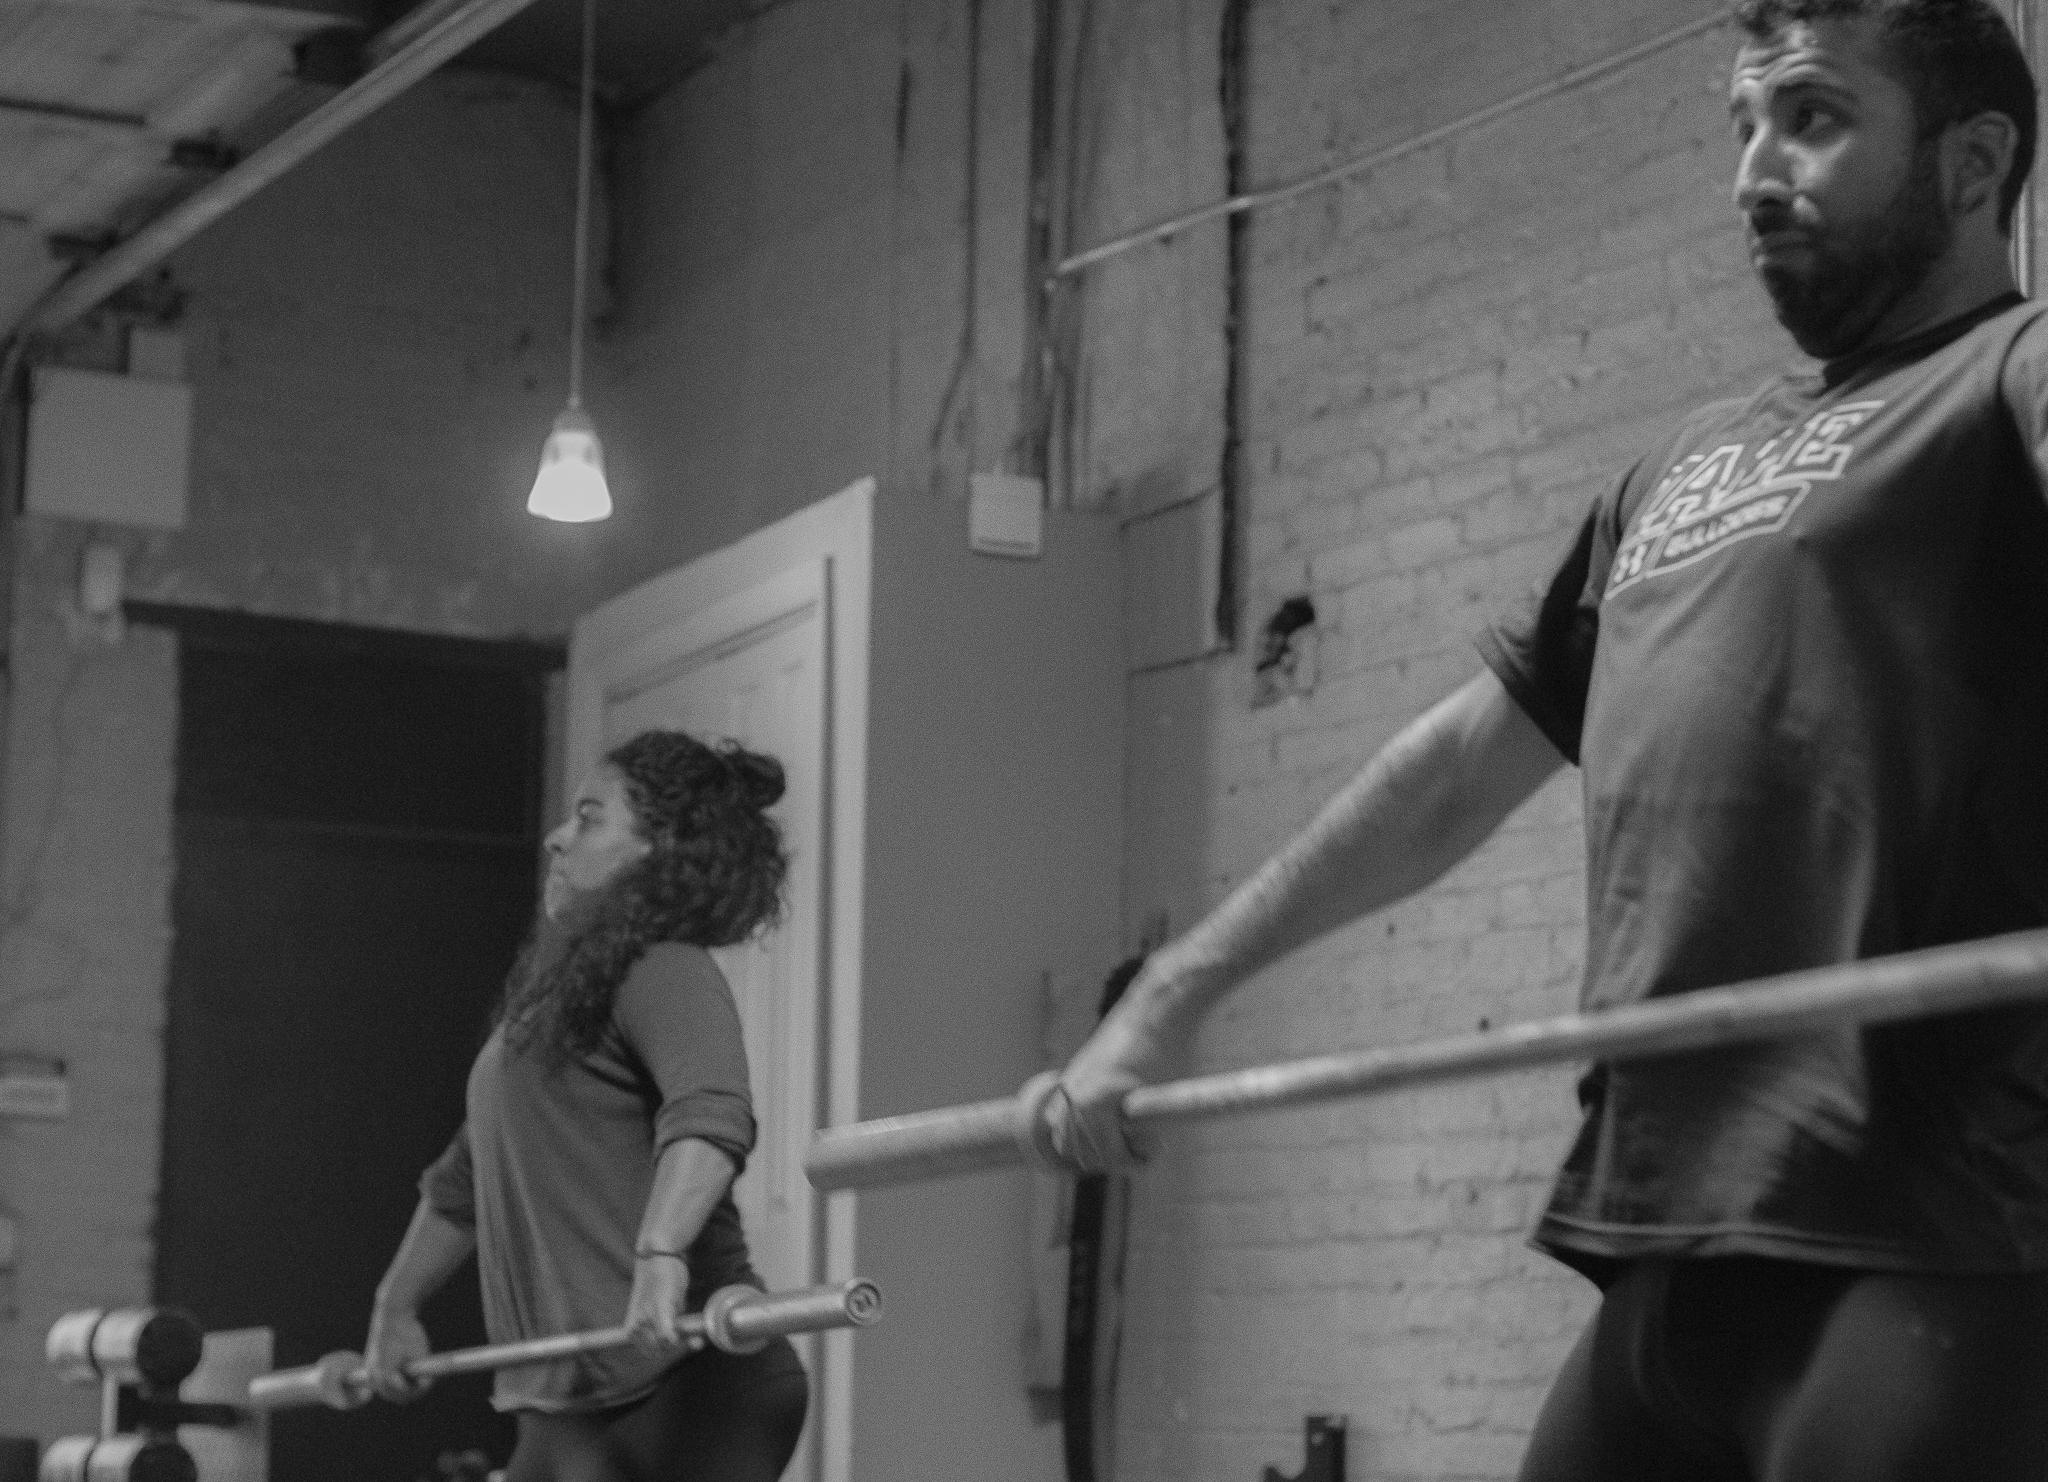 james-wright-visit-brooklyn-new-york-weightlifting-coach-teammates-october-2016 (8 of 92).jpg